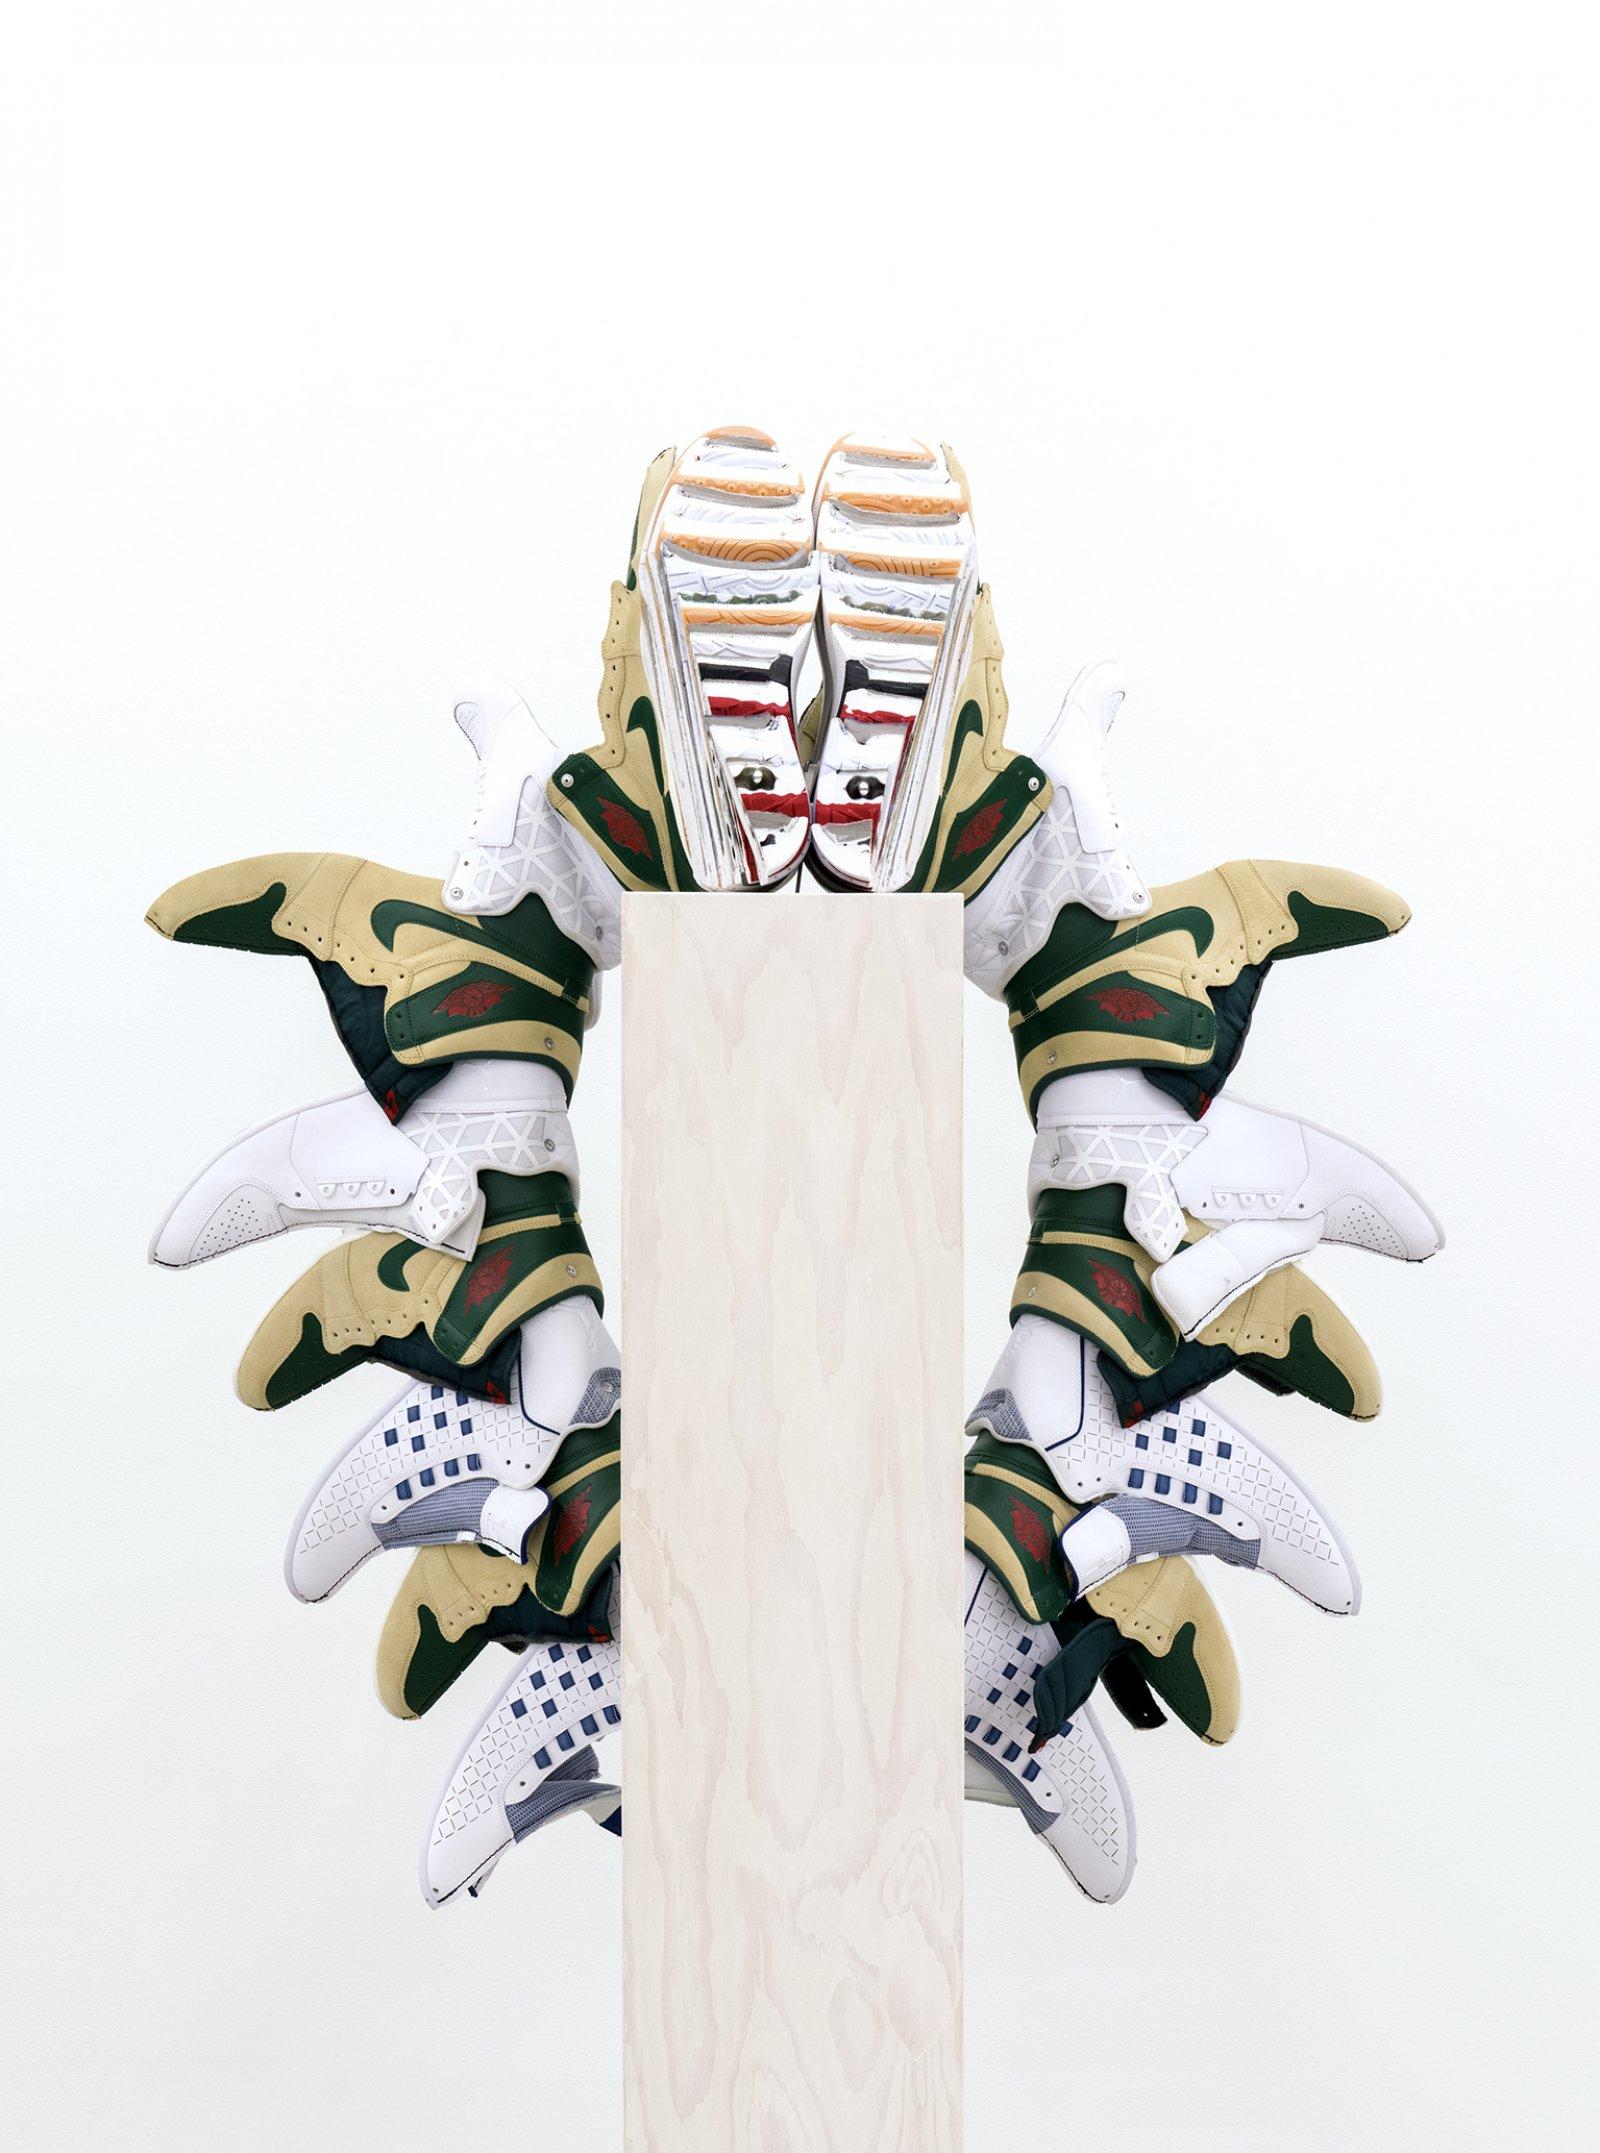 Brian Jungen, Walk This Way (Fall), 2015–2016, nike air jordans, painted fir plywood, stainless steel, 75 x 24 x 24 in. (191 x 61 x 61 cm) by Brian Jungen